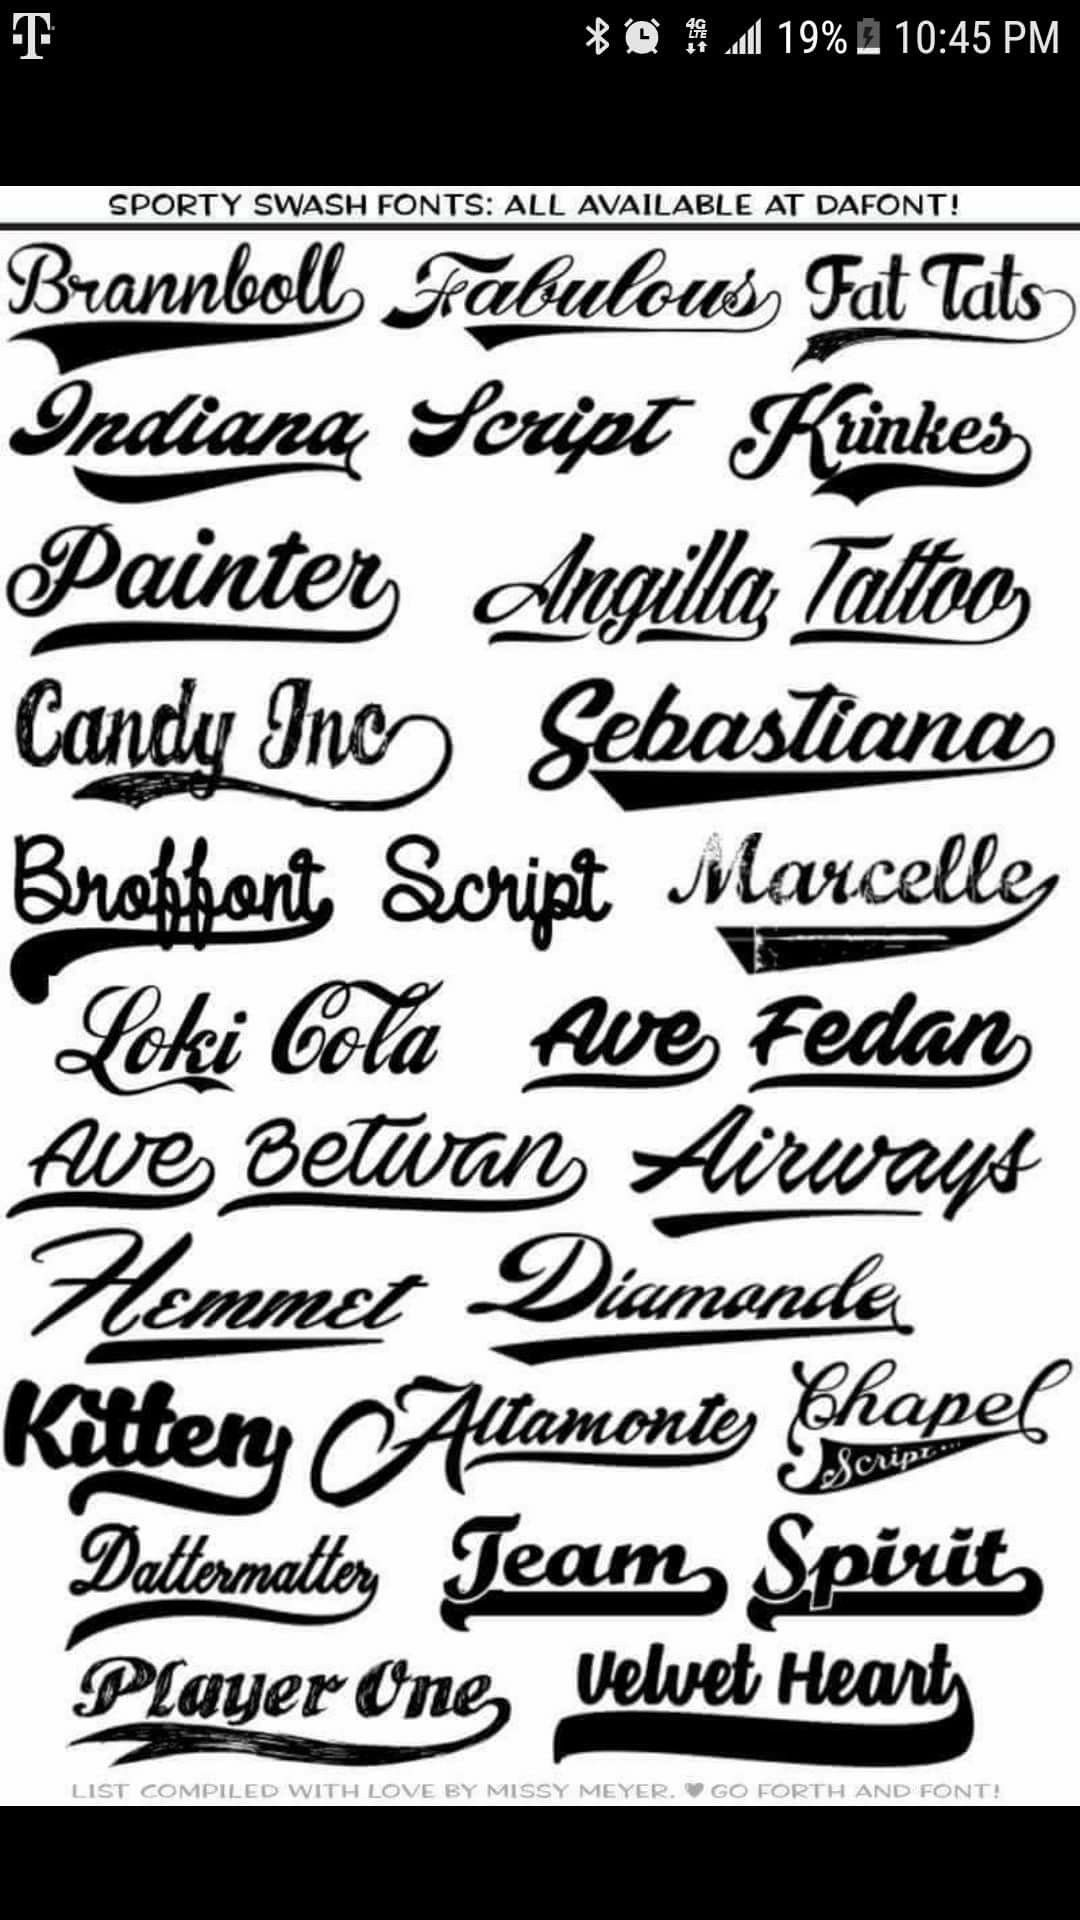 Sporty Swash Fonts at DaFont | Cricut | Pinterest | Cricut ...